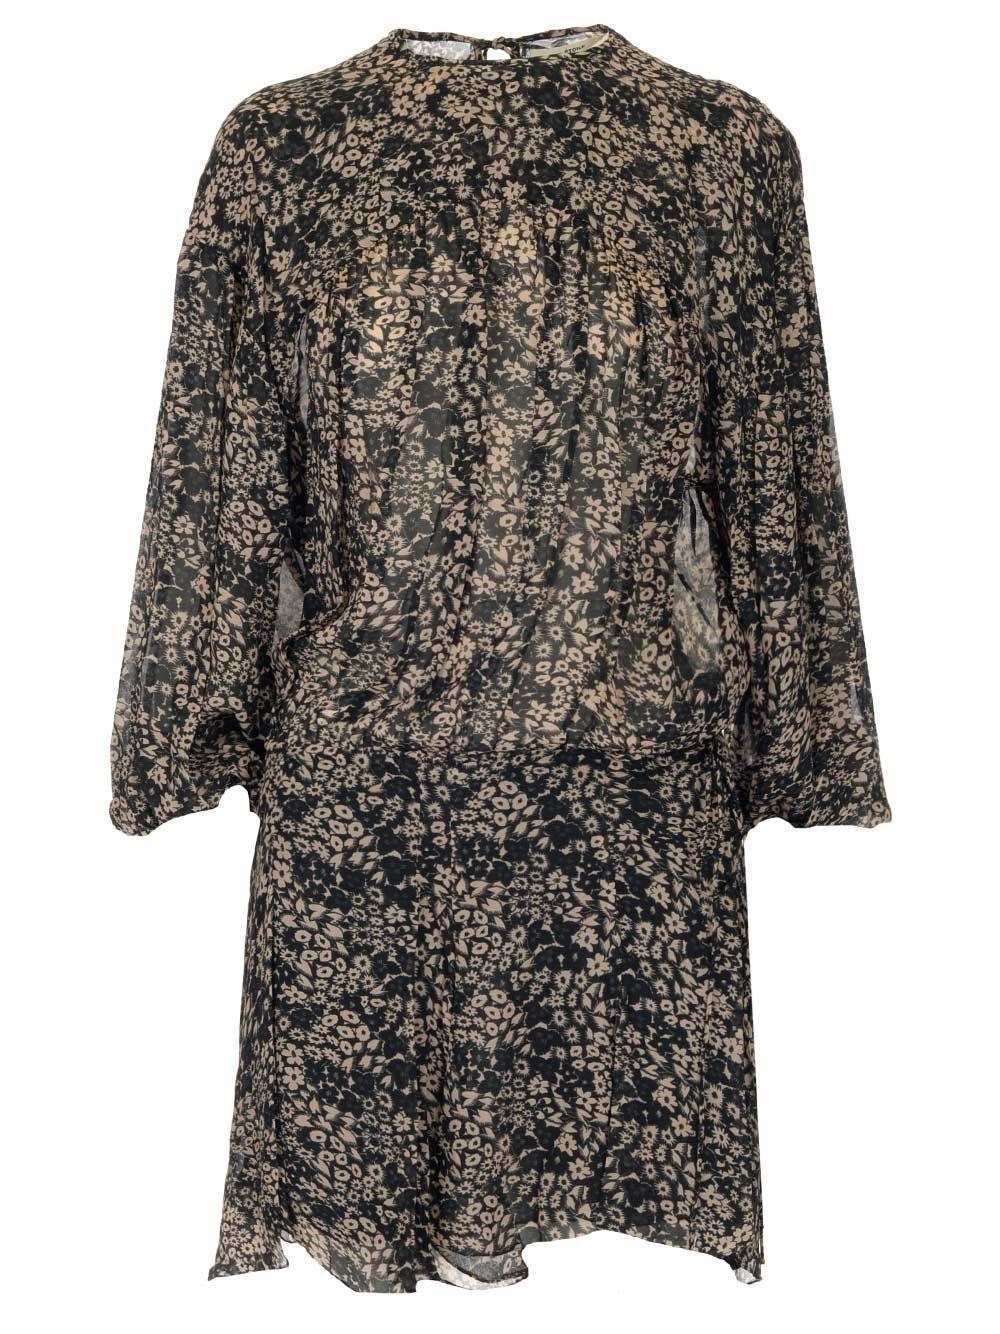 Isabel Marant Étoile Women's Black Dress